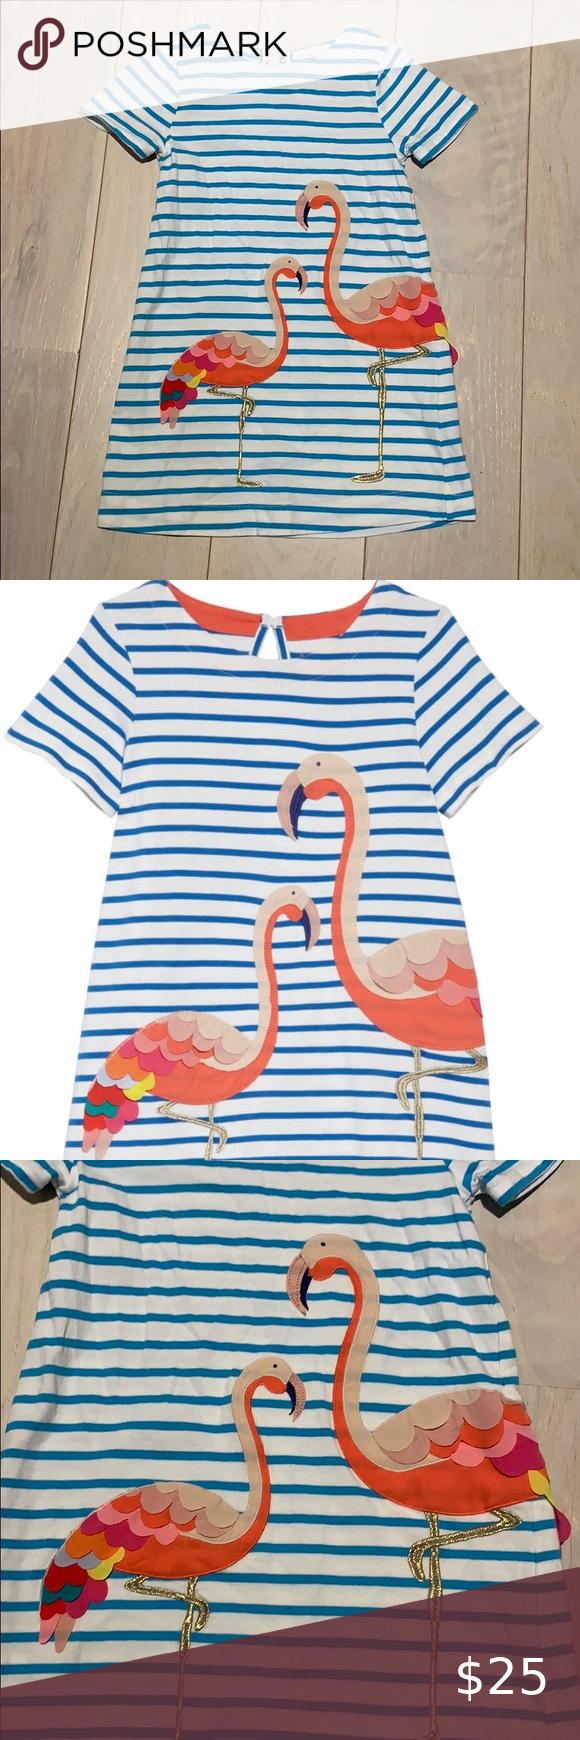 short sleeve various sizes available New Flamingo Applique Dress